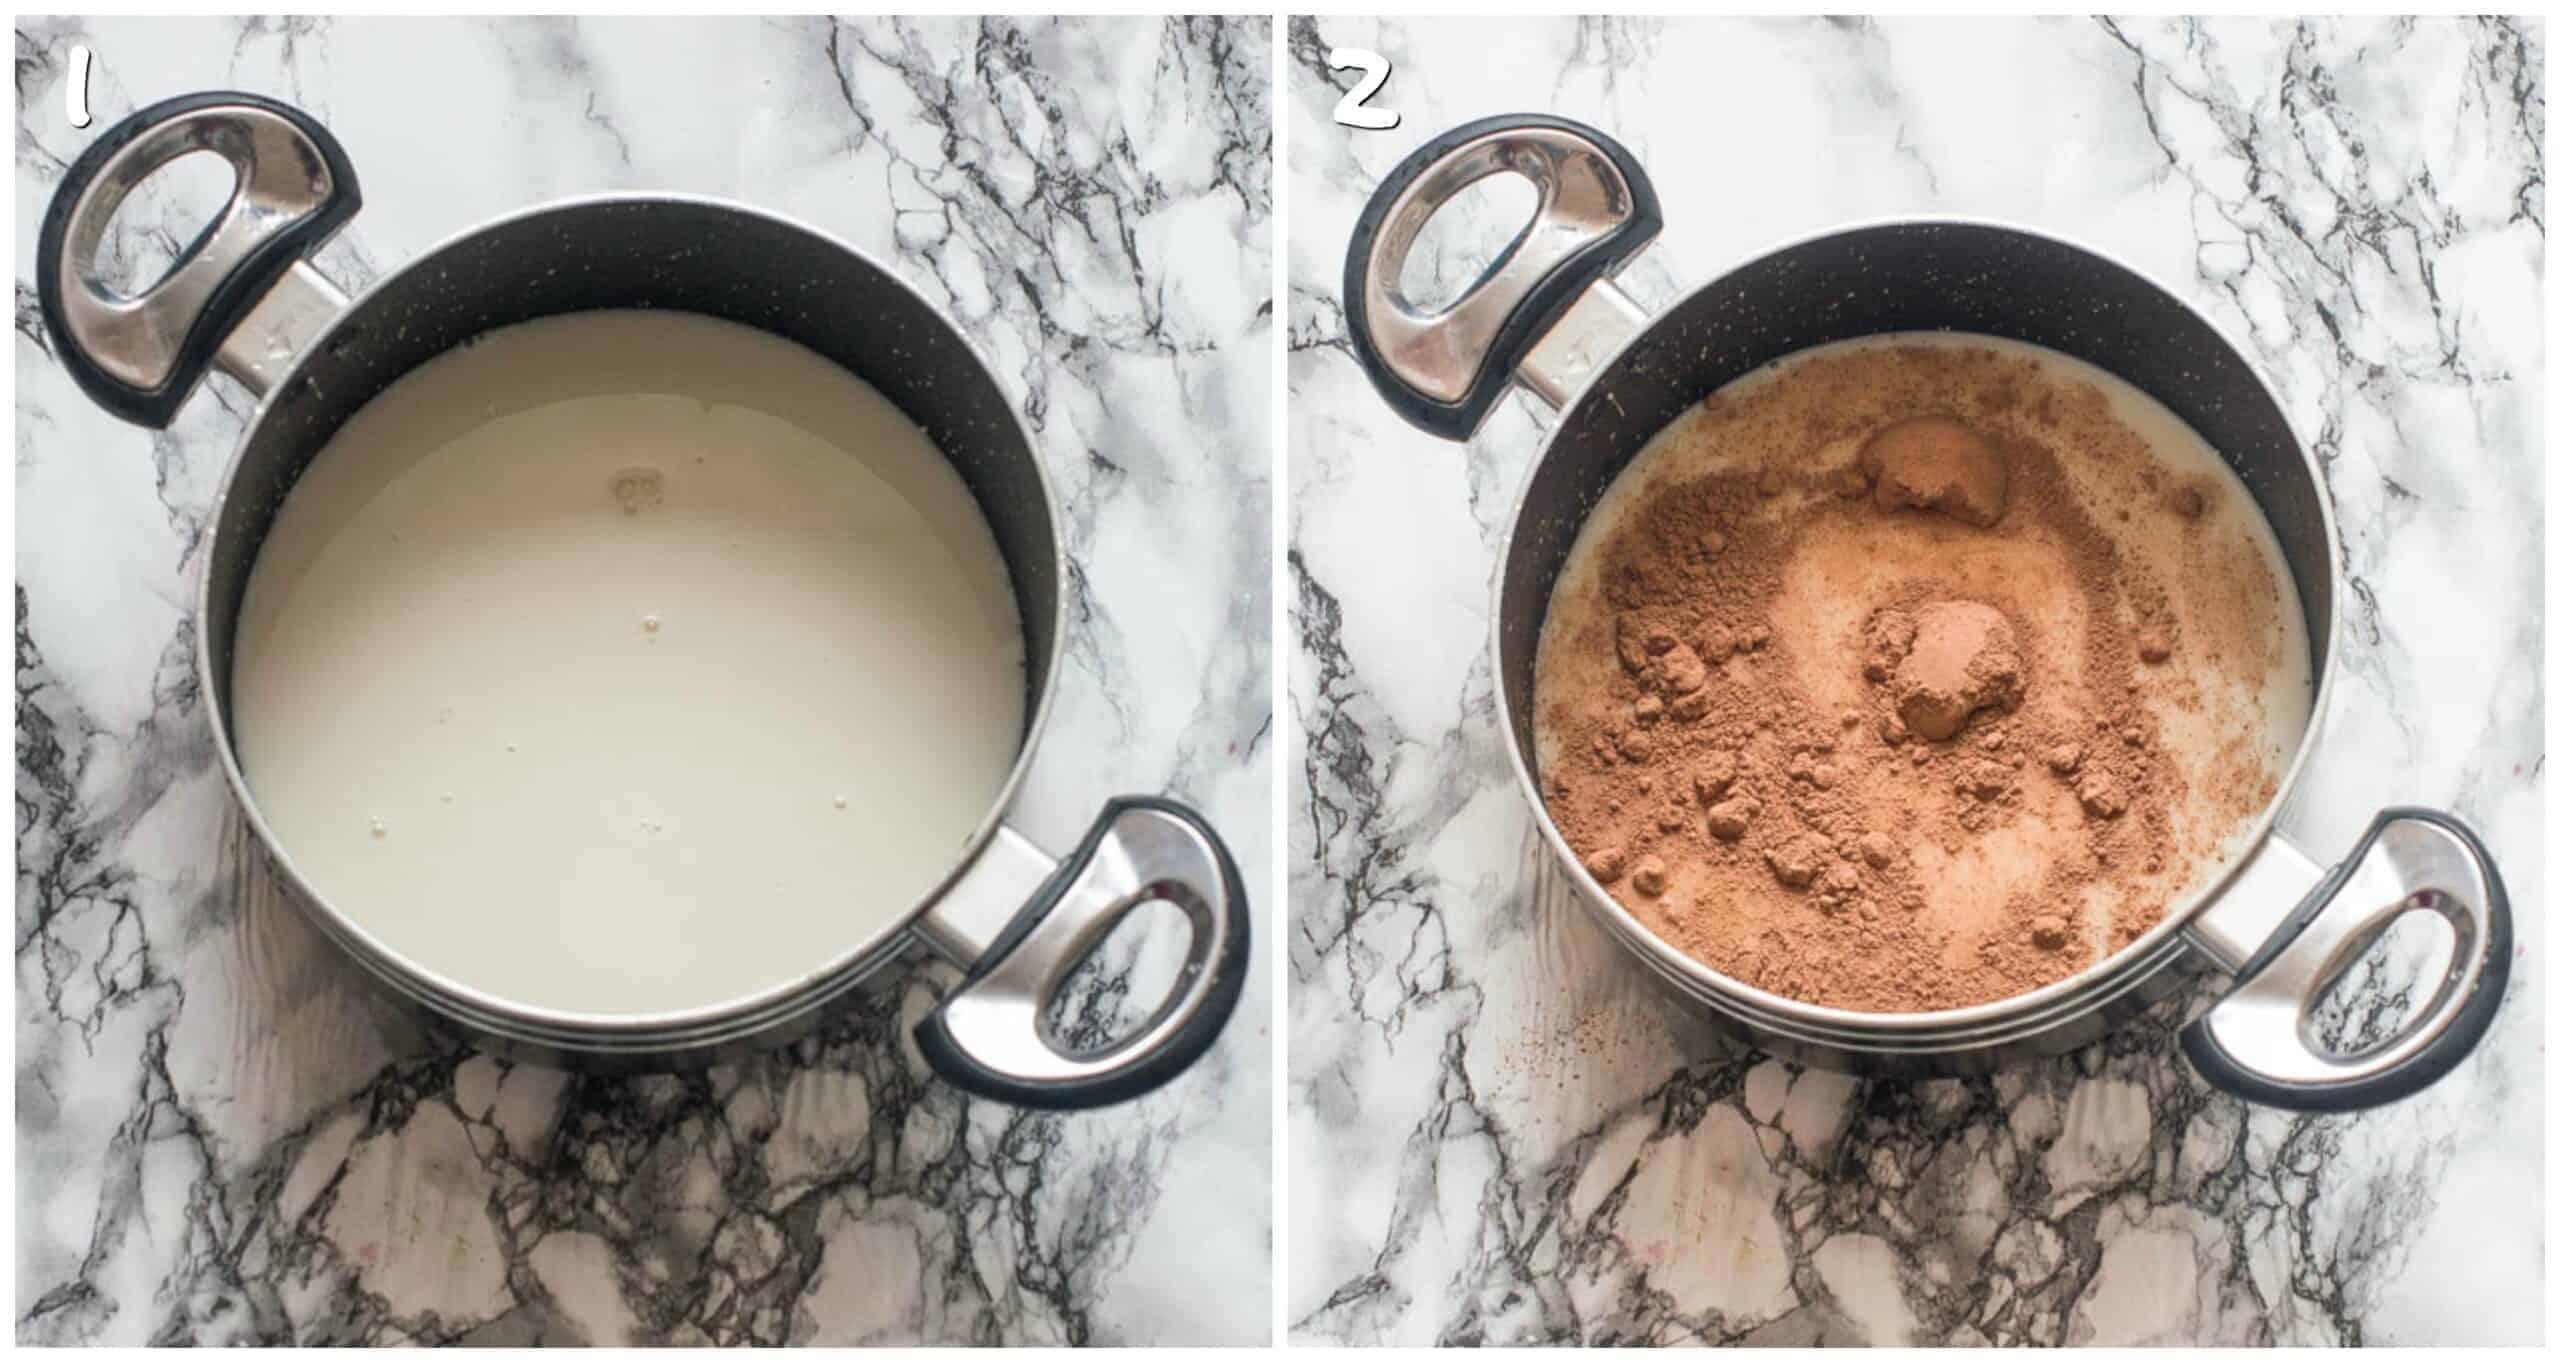 Steps 1-2 almond milk with cacao powder